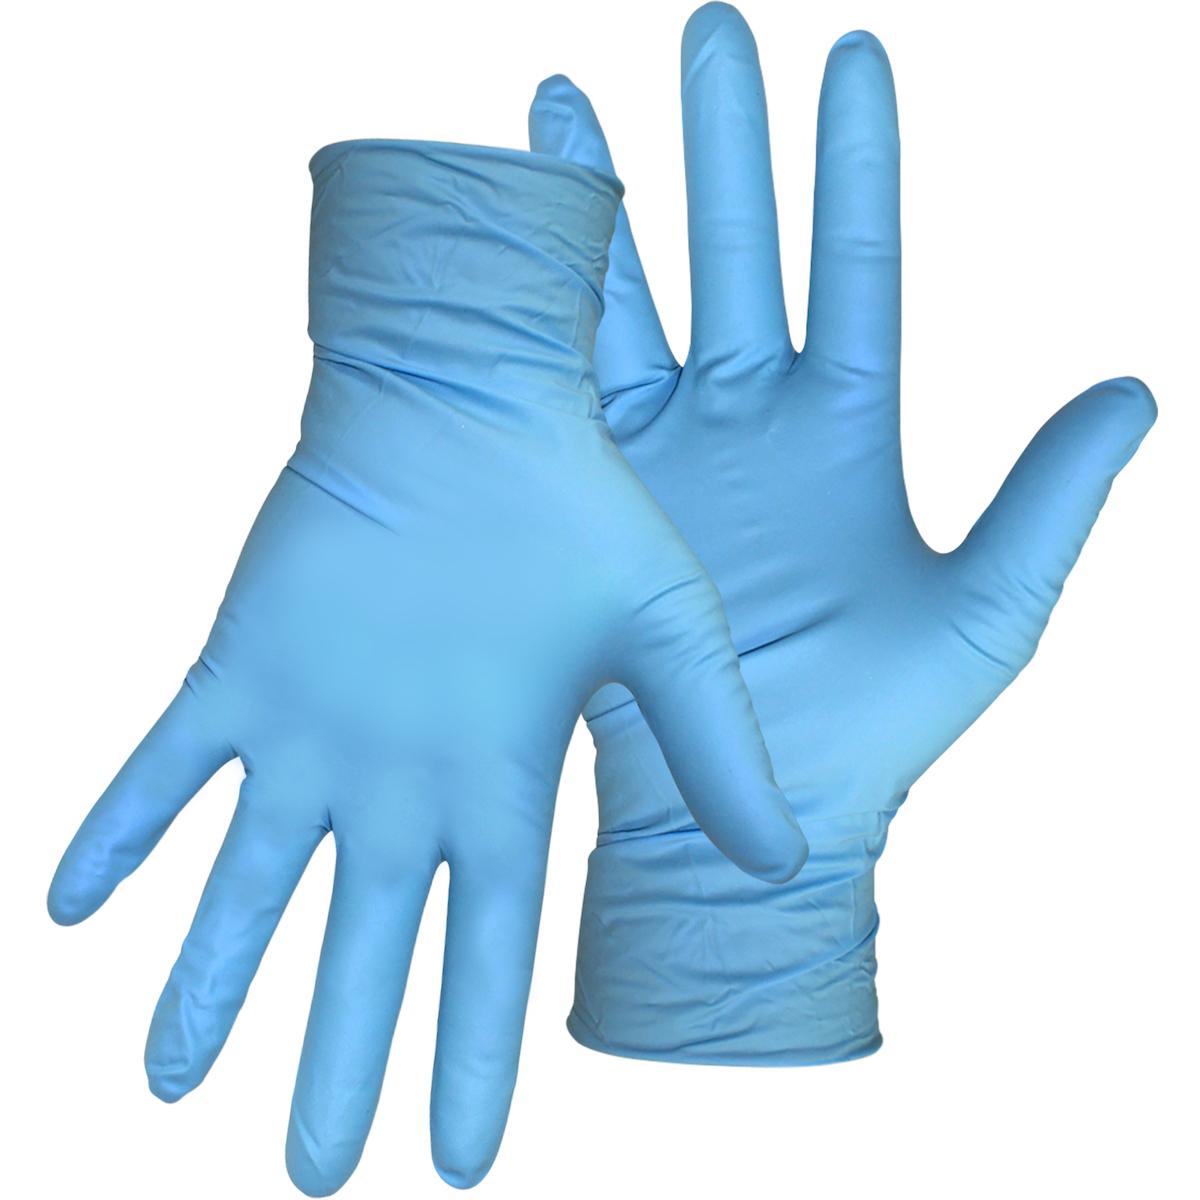 "General Grade 8 Mil, Disposable Nitrile Gloves  - 9.5"" - Powder-Free, Blue, 2XL"